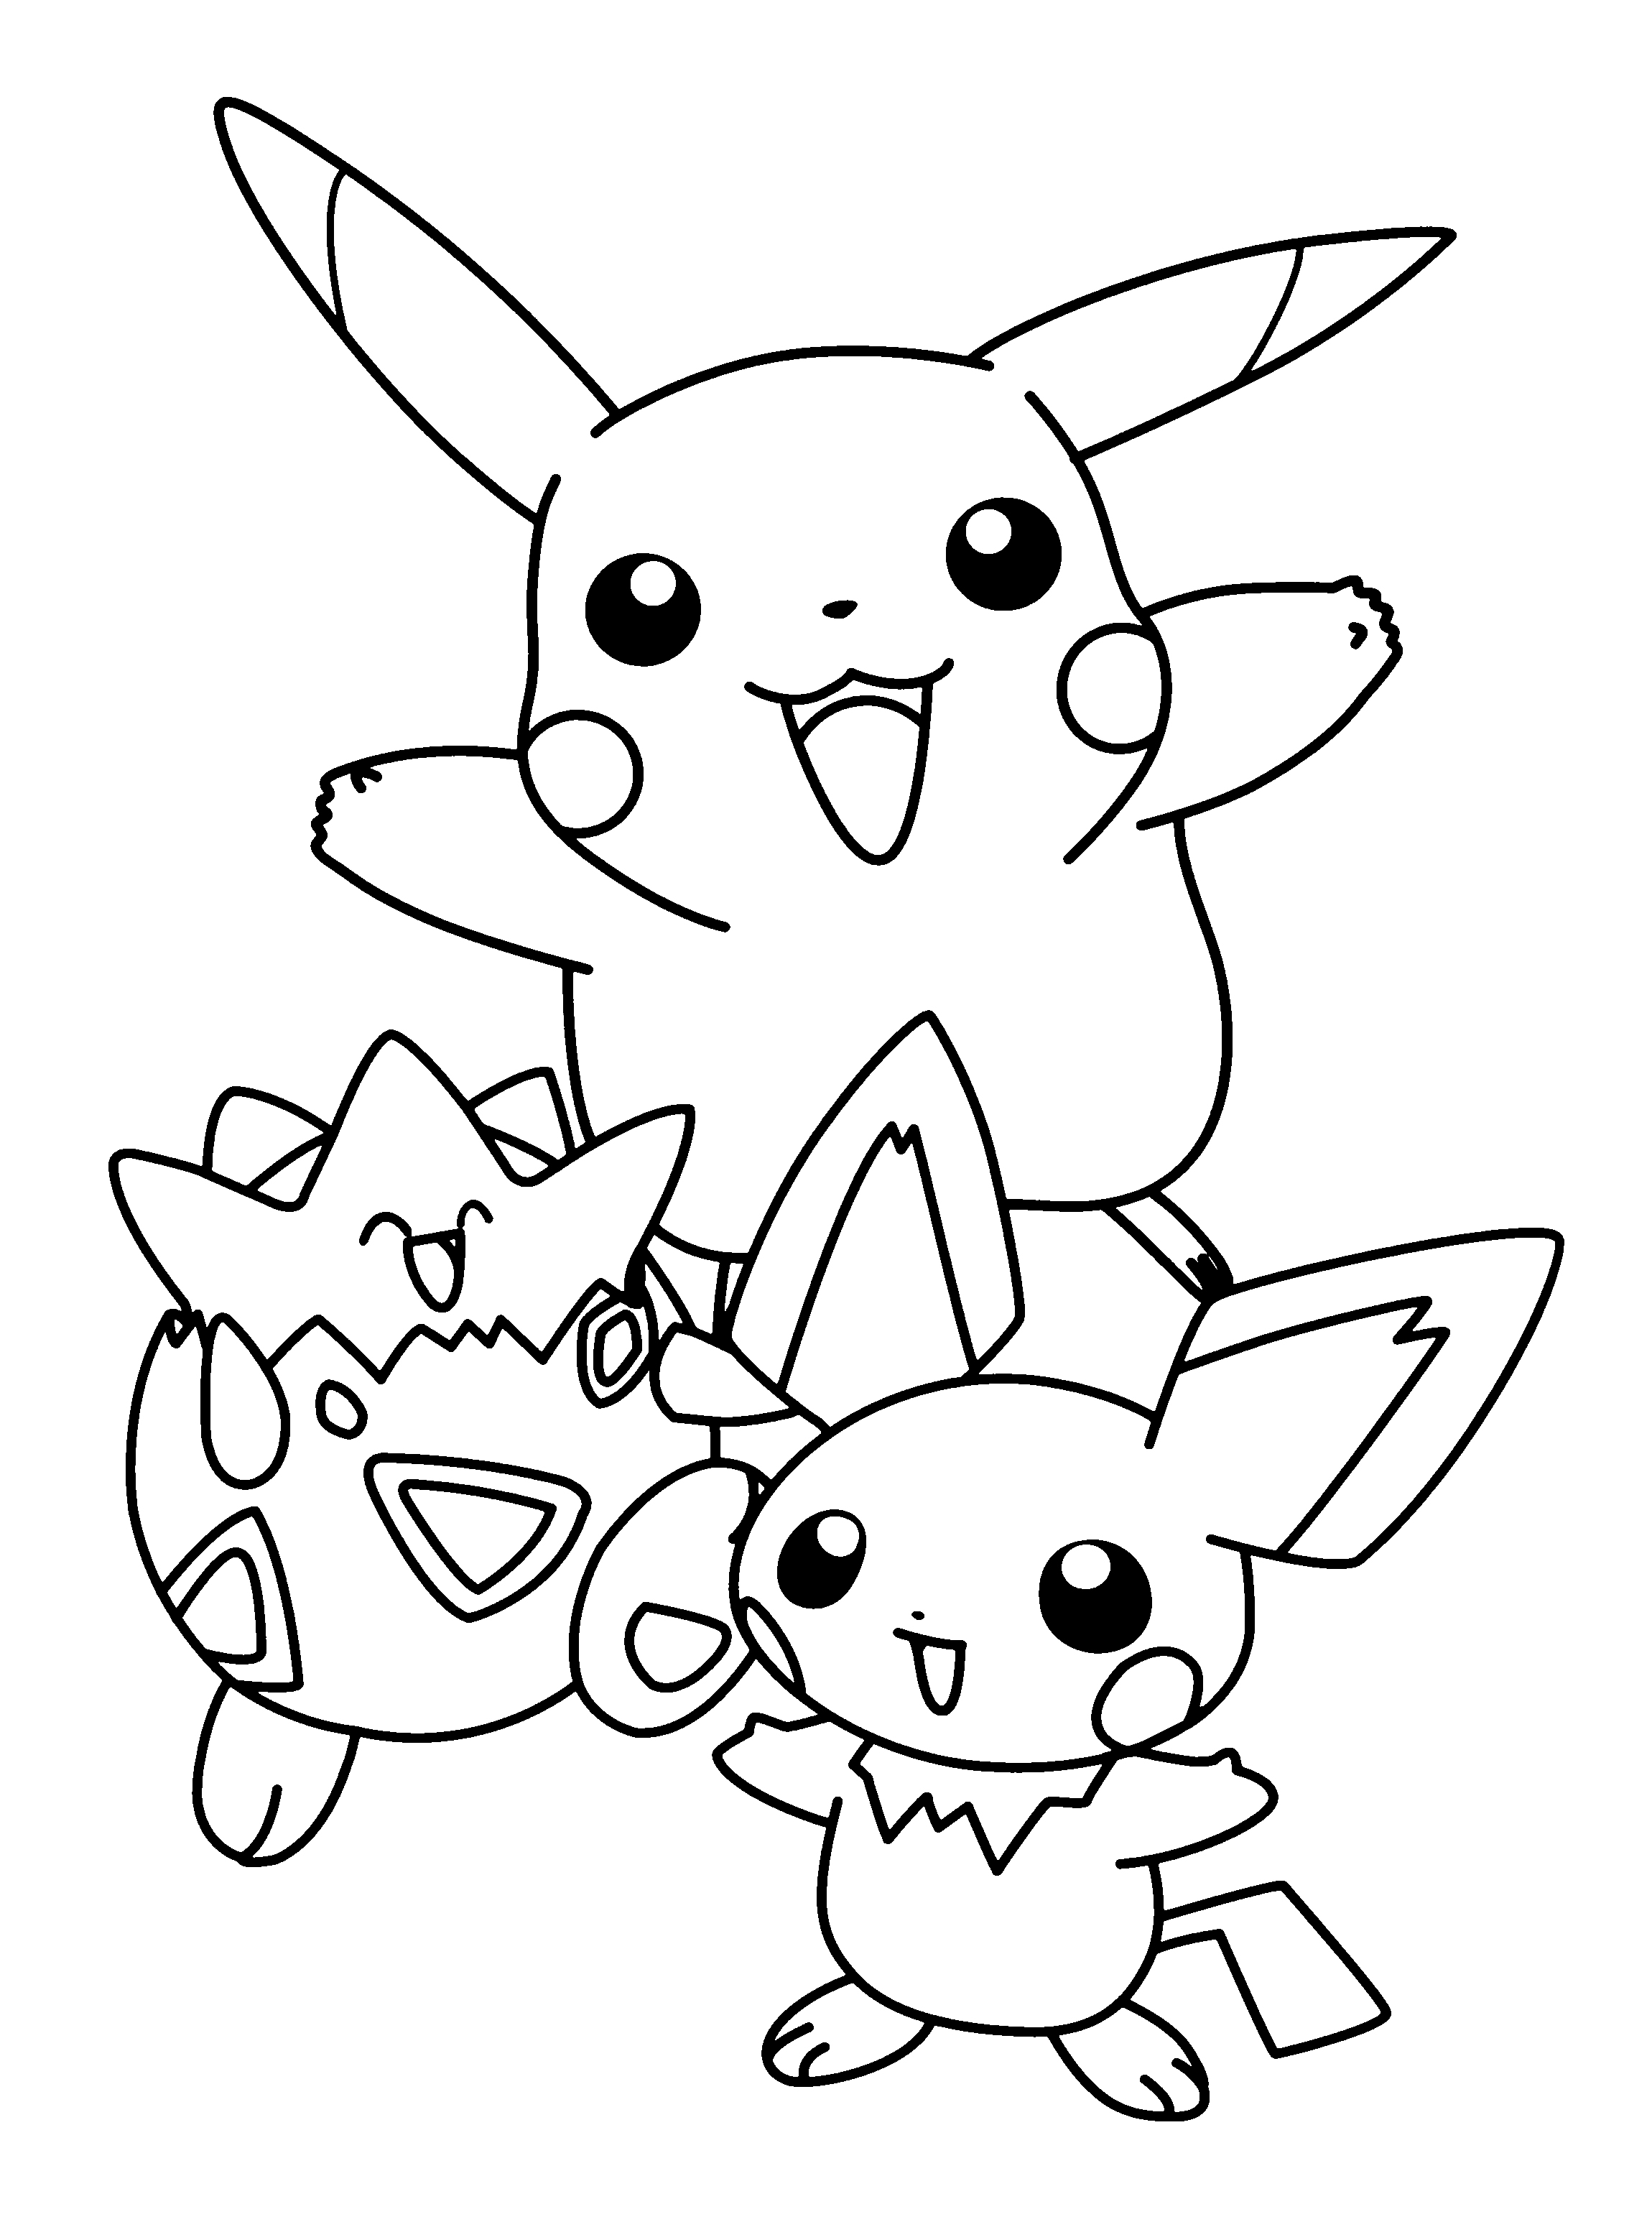 Awesome Printable Top 75 Free Printable Pokemon Coloring Pages Line - Free Printable Pokemon Coloring Pages